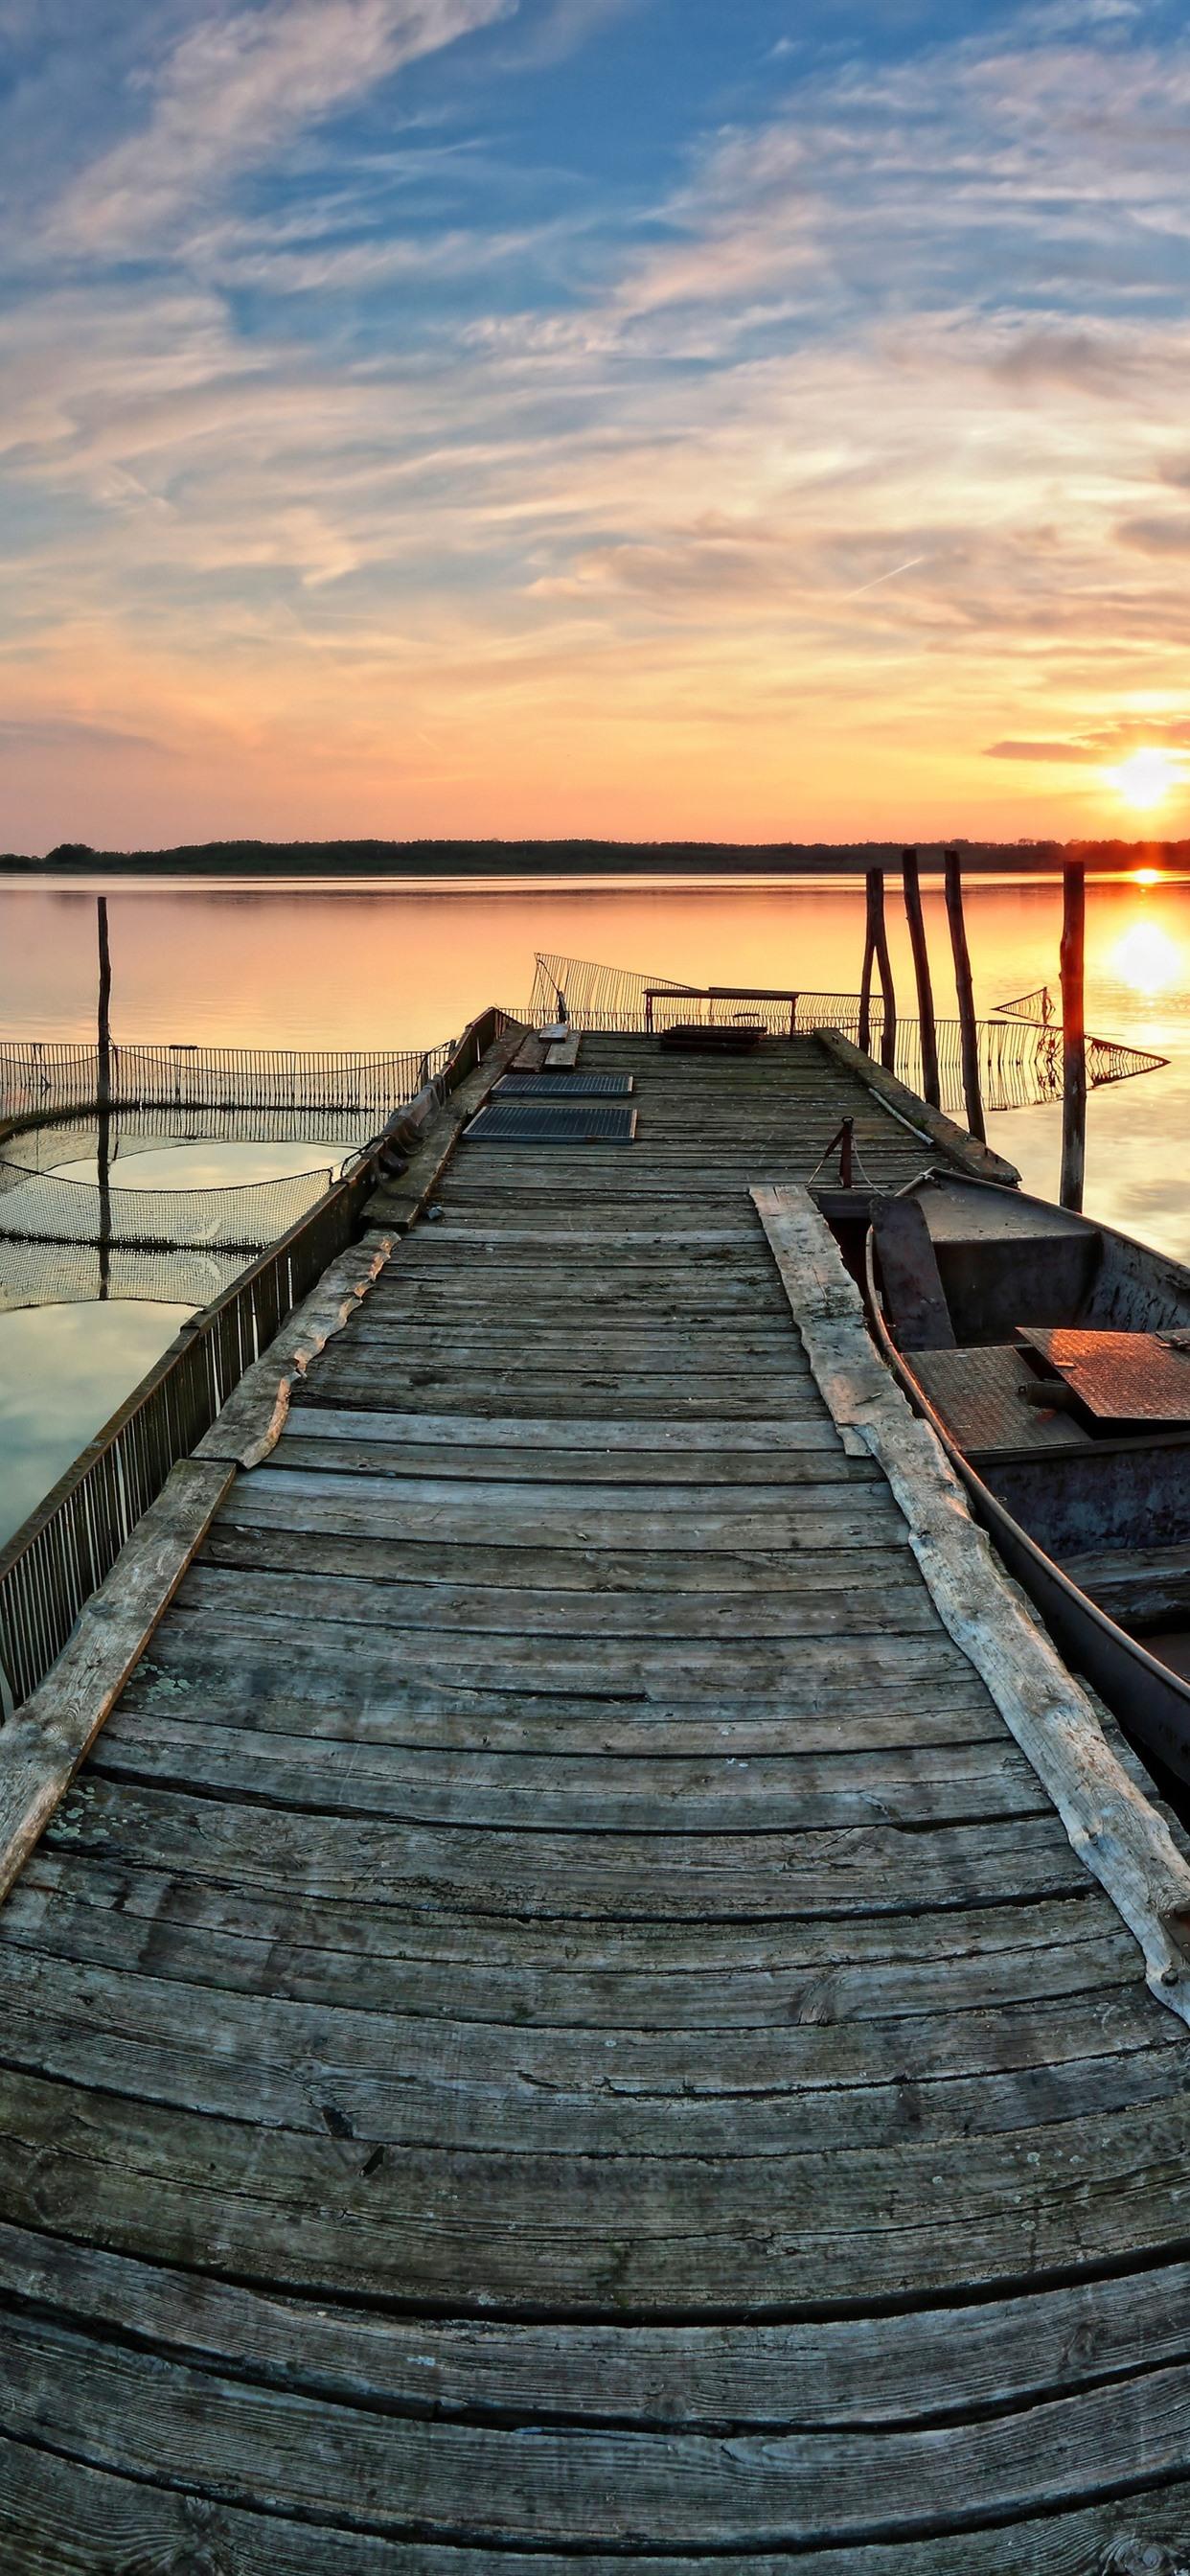 Lake Boat Pier Sunset 1242x2688 Iphone Xs Max Wallpaper